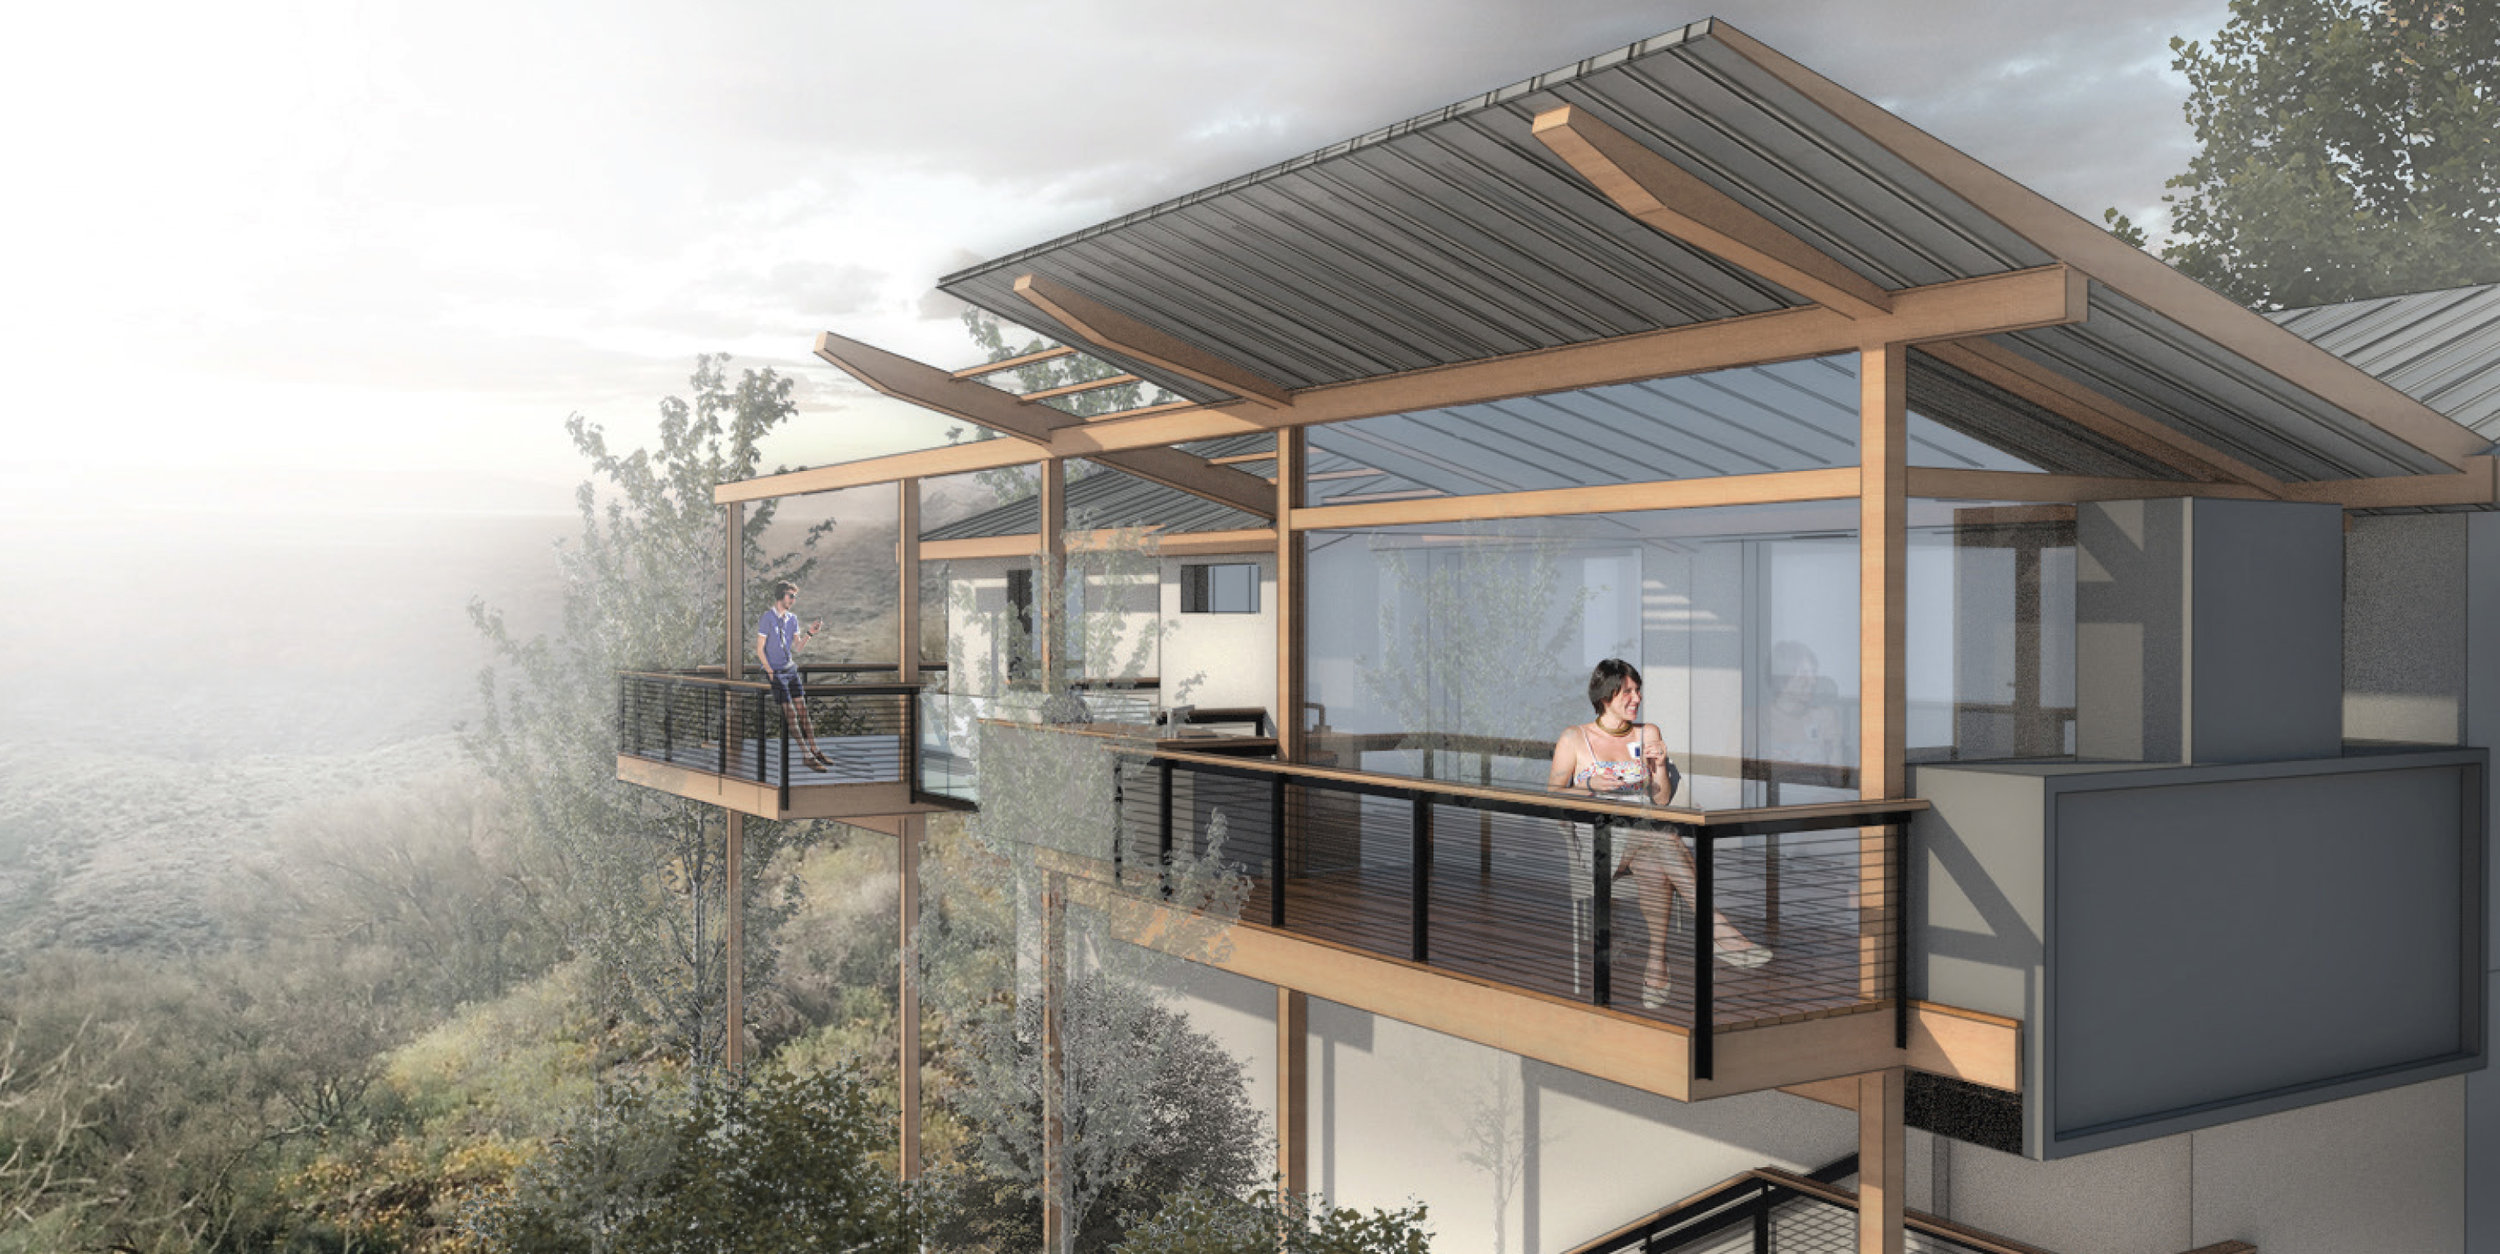 balogh rendering - living deck.jpg